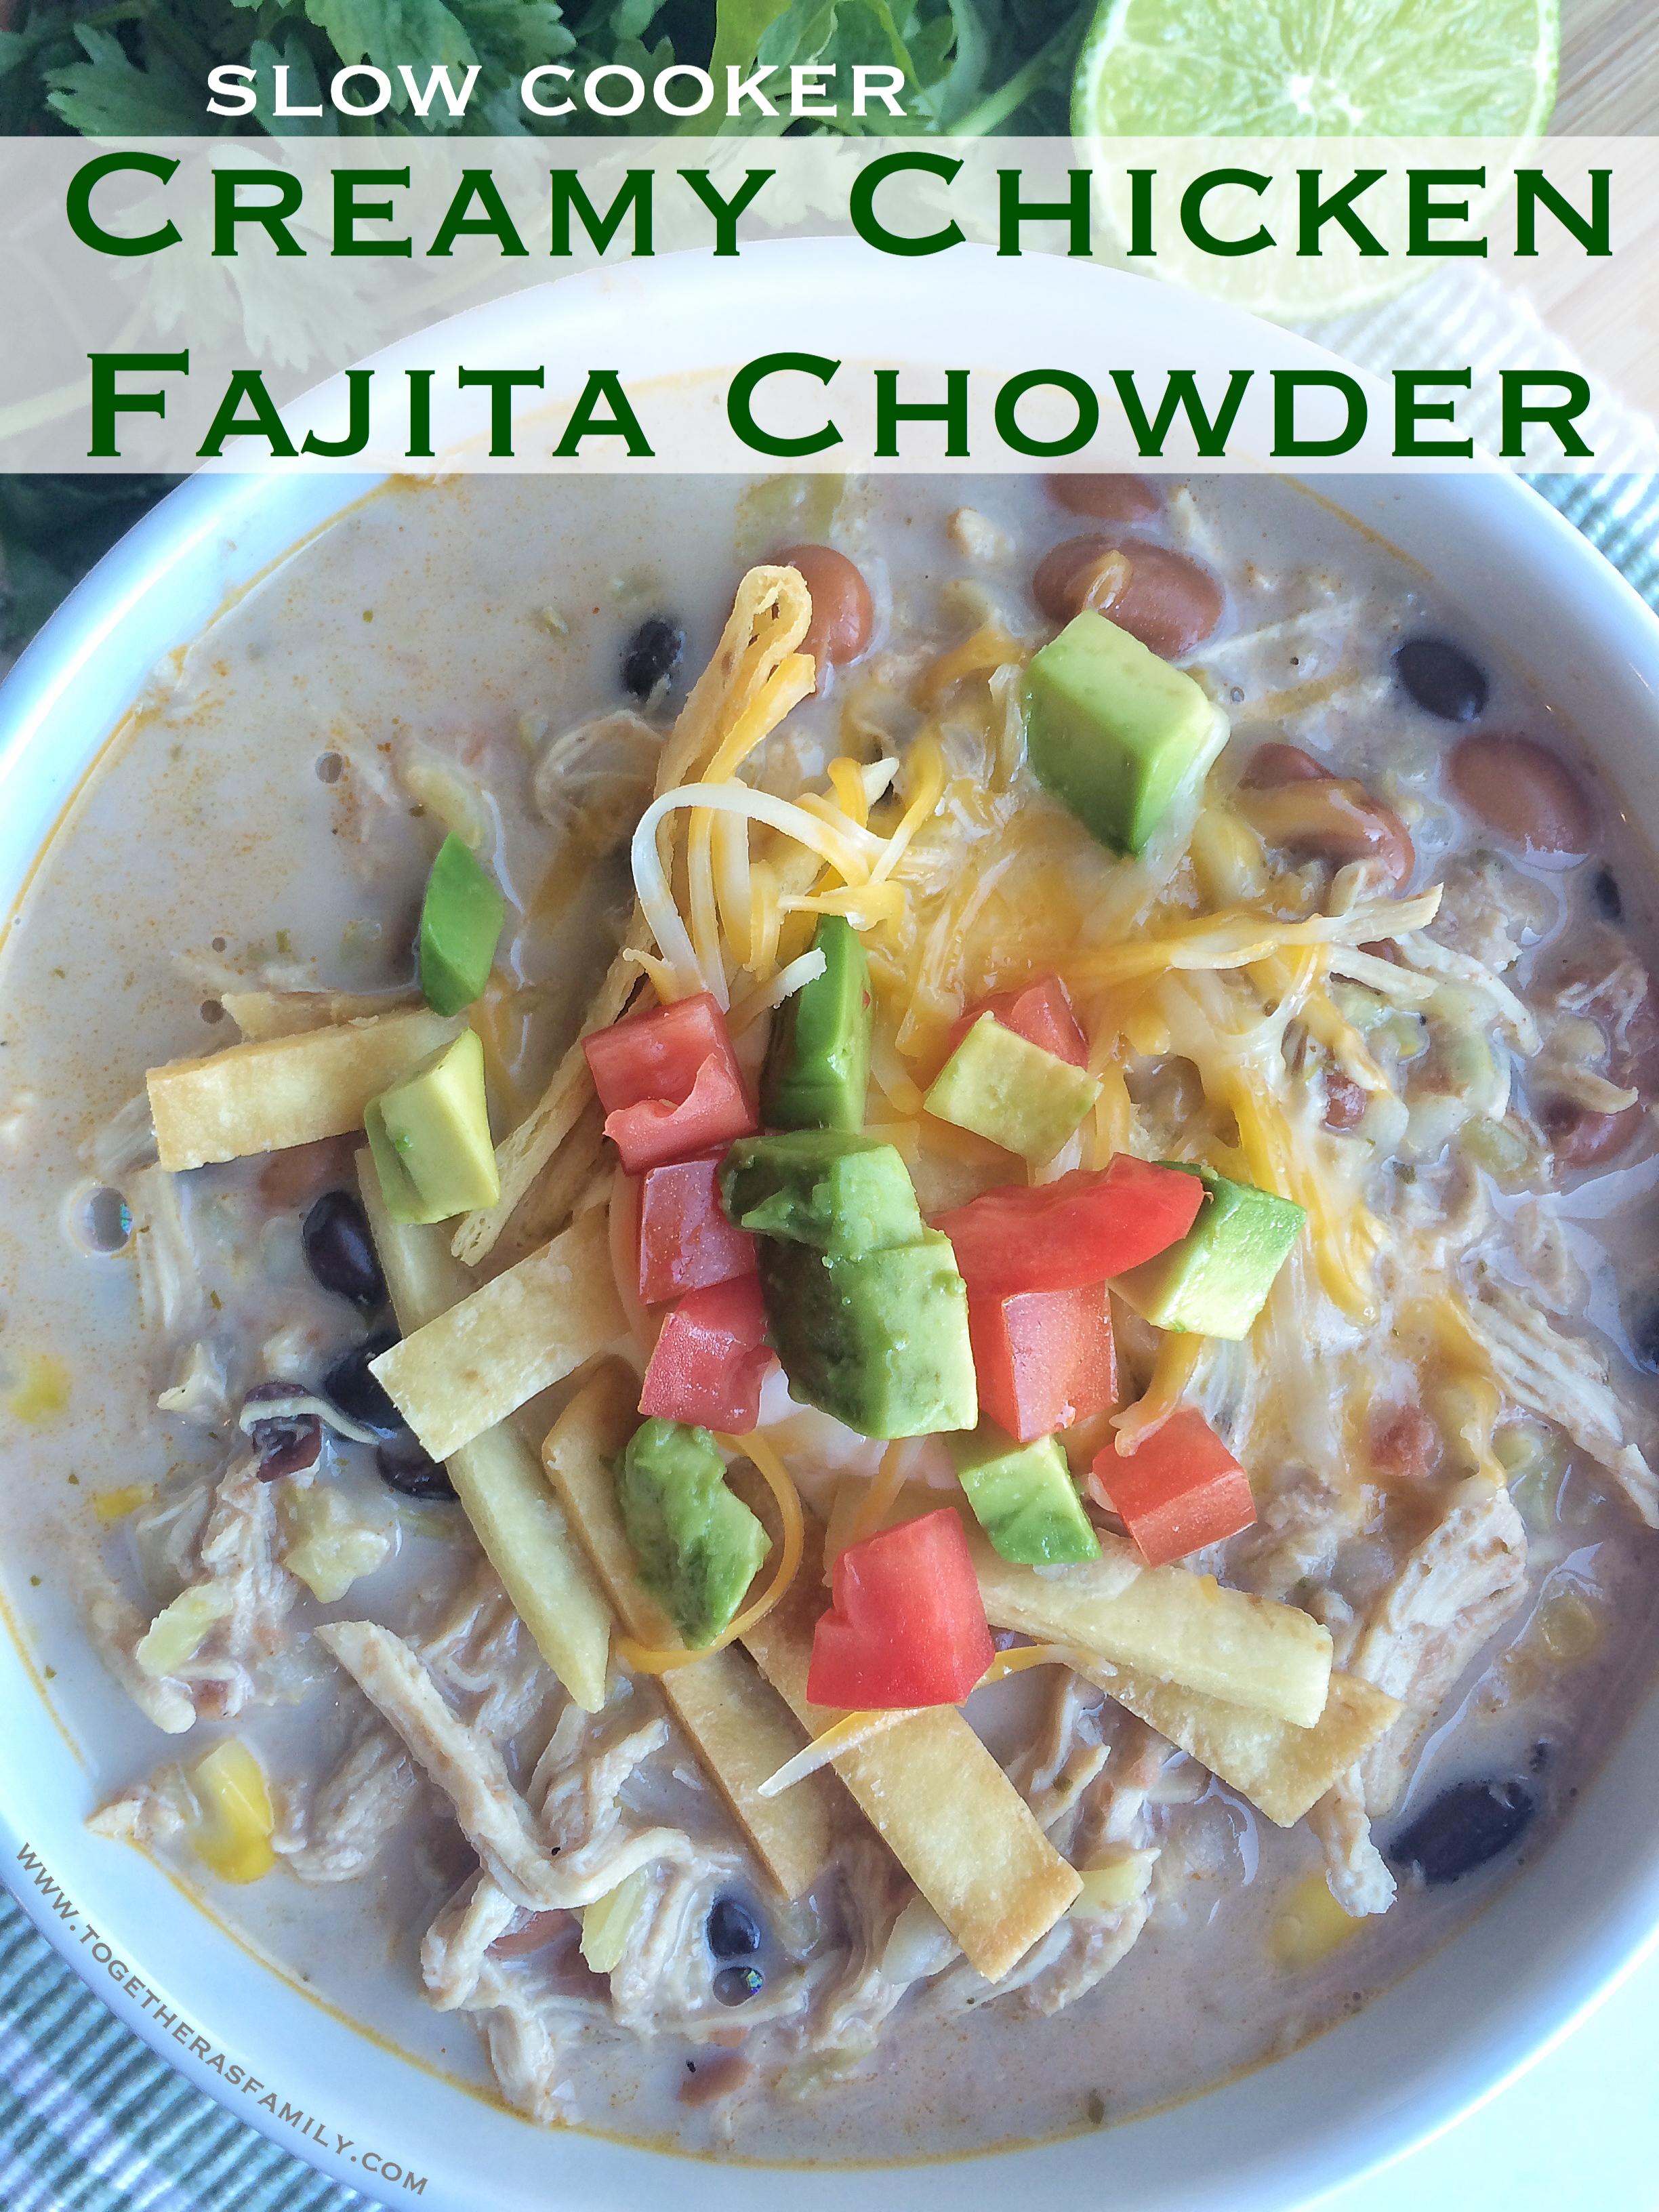 Slow Cooker Creamy Chicken Fajita Chowder - Together as Family